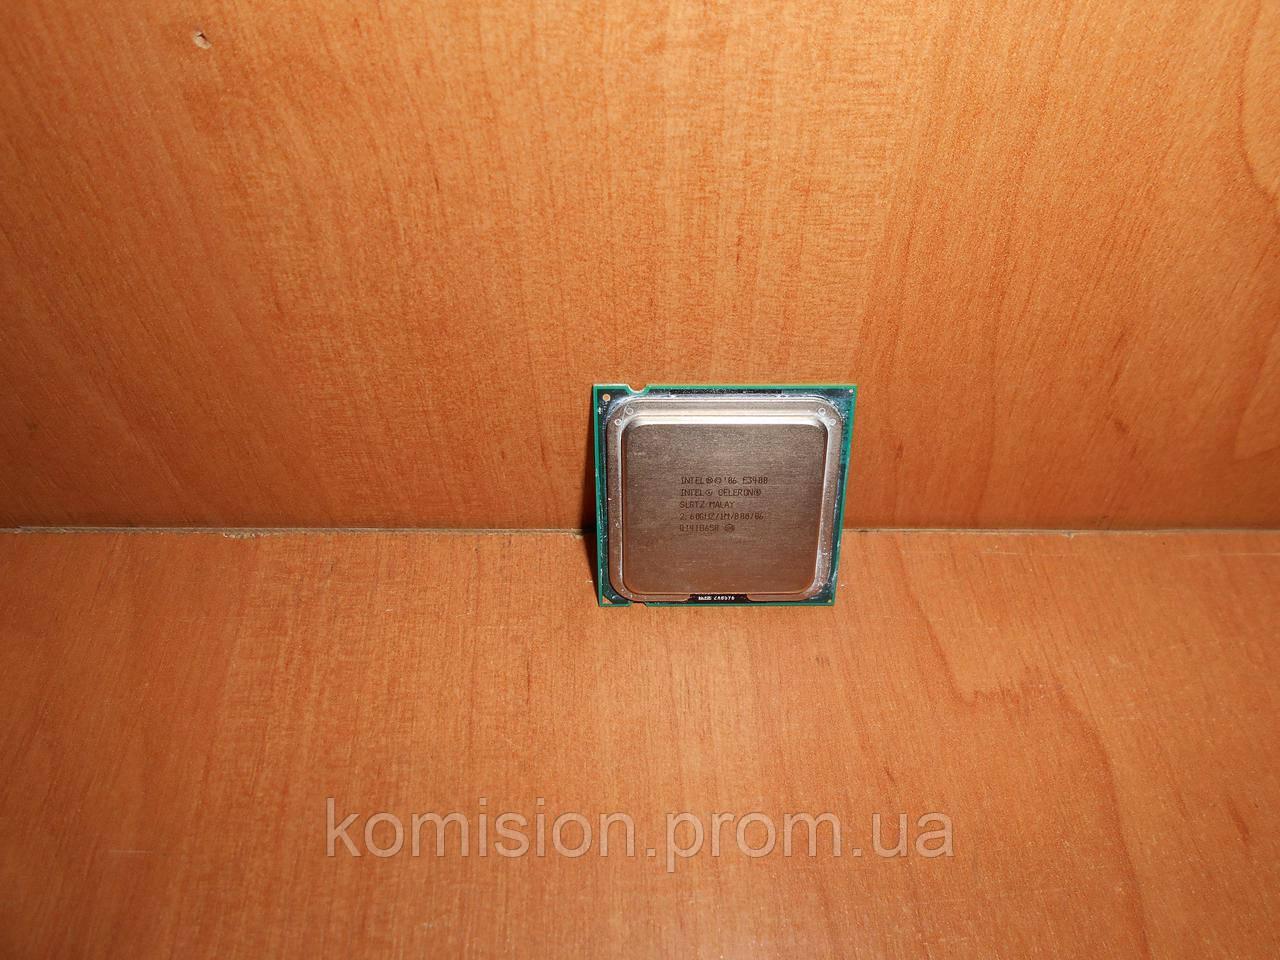 Процессор INTEL Dual Core Celeron E3400 2,6 GHz s775